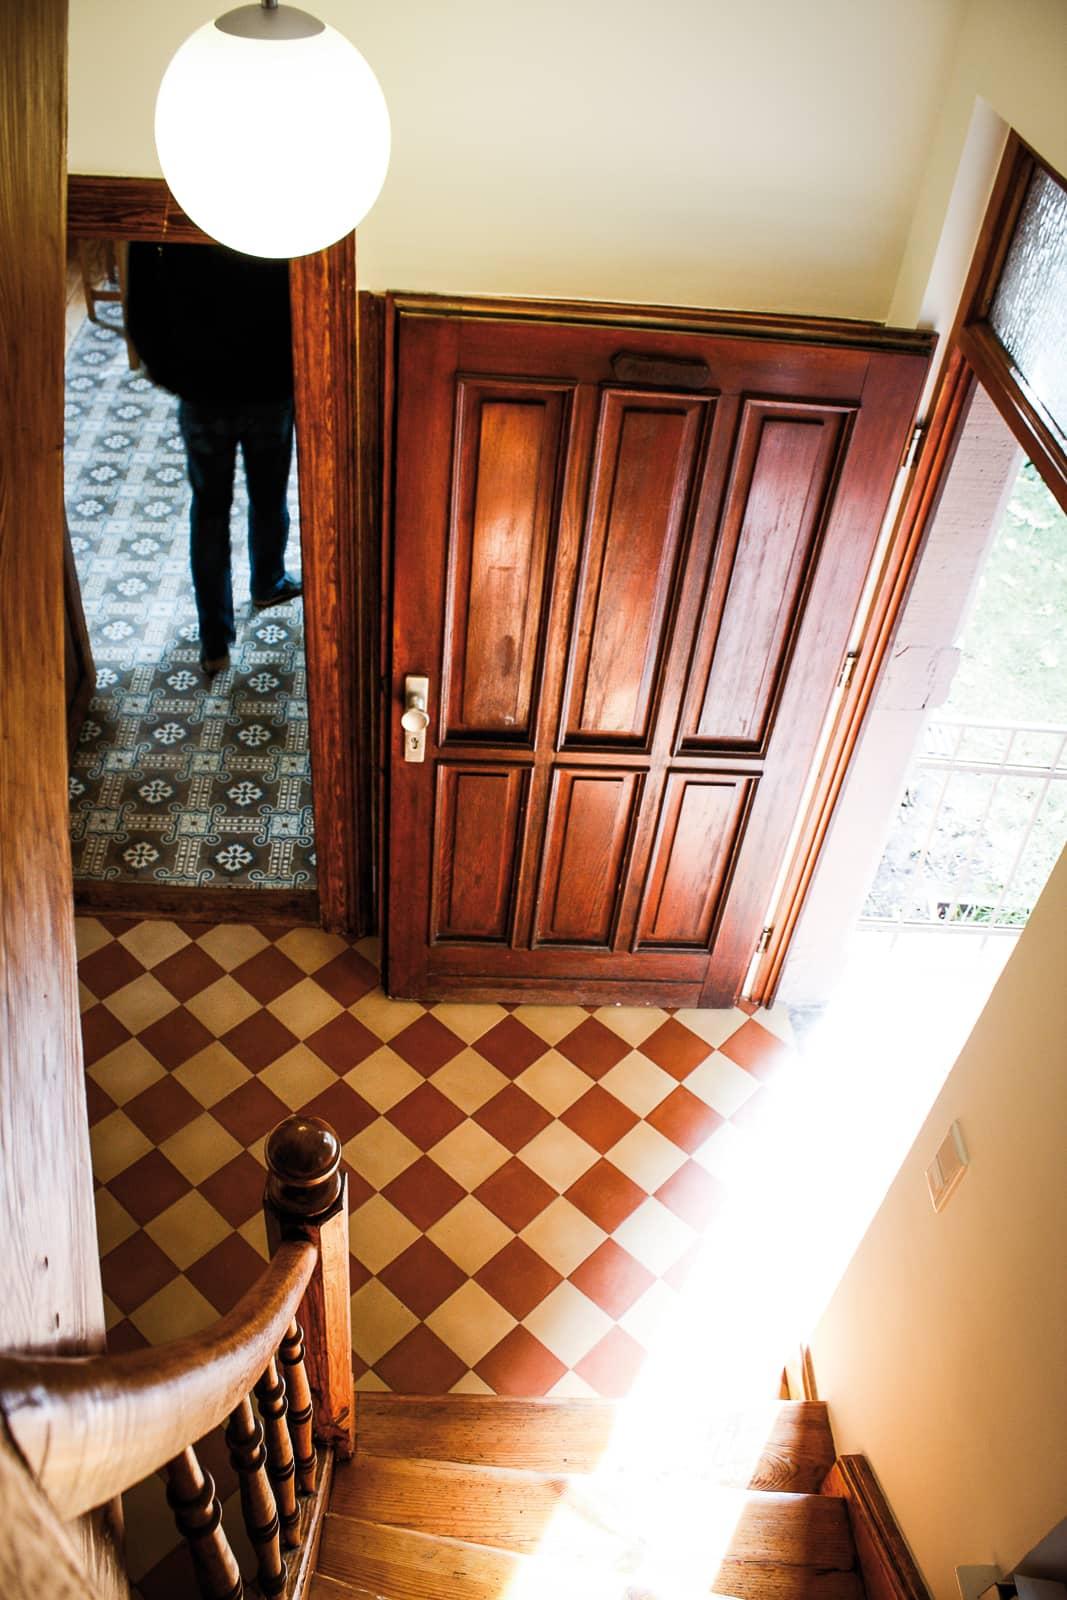 zementfliesen-terrazzofliesen-kreidefarbe-terrazzo-fugenlos-viaplatten-11-33-eingang | 33